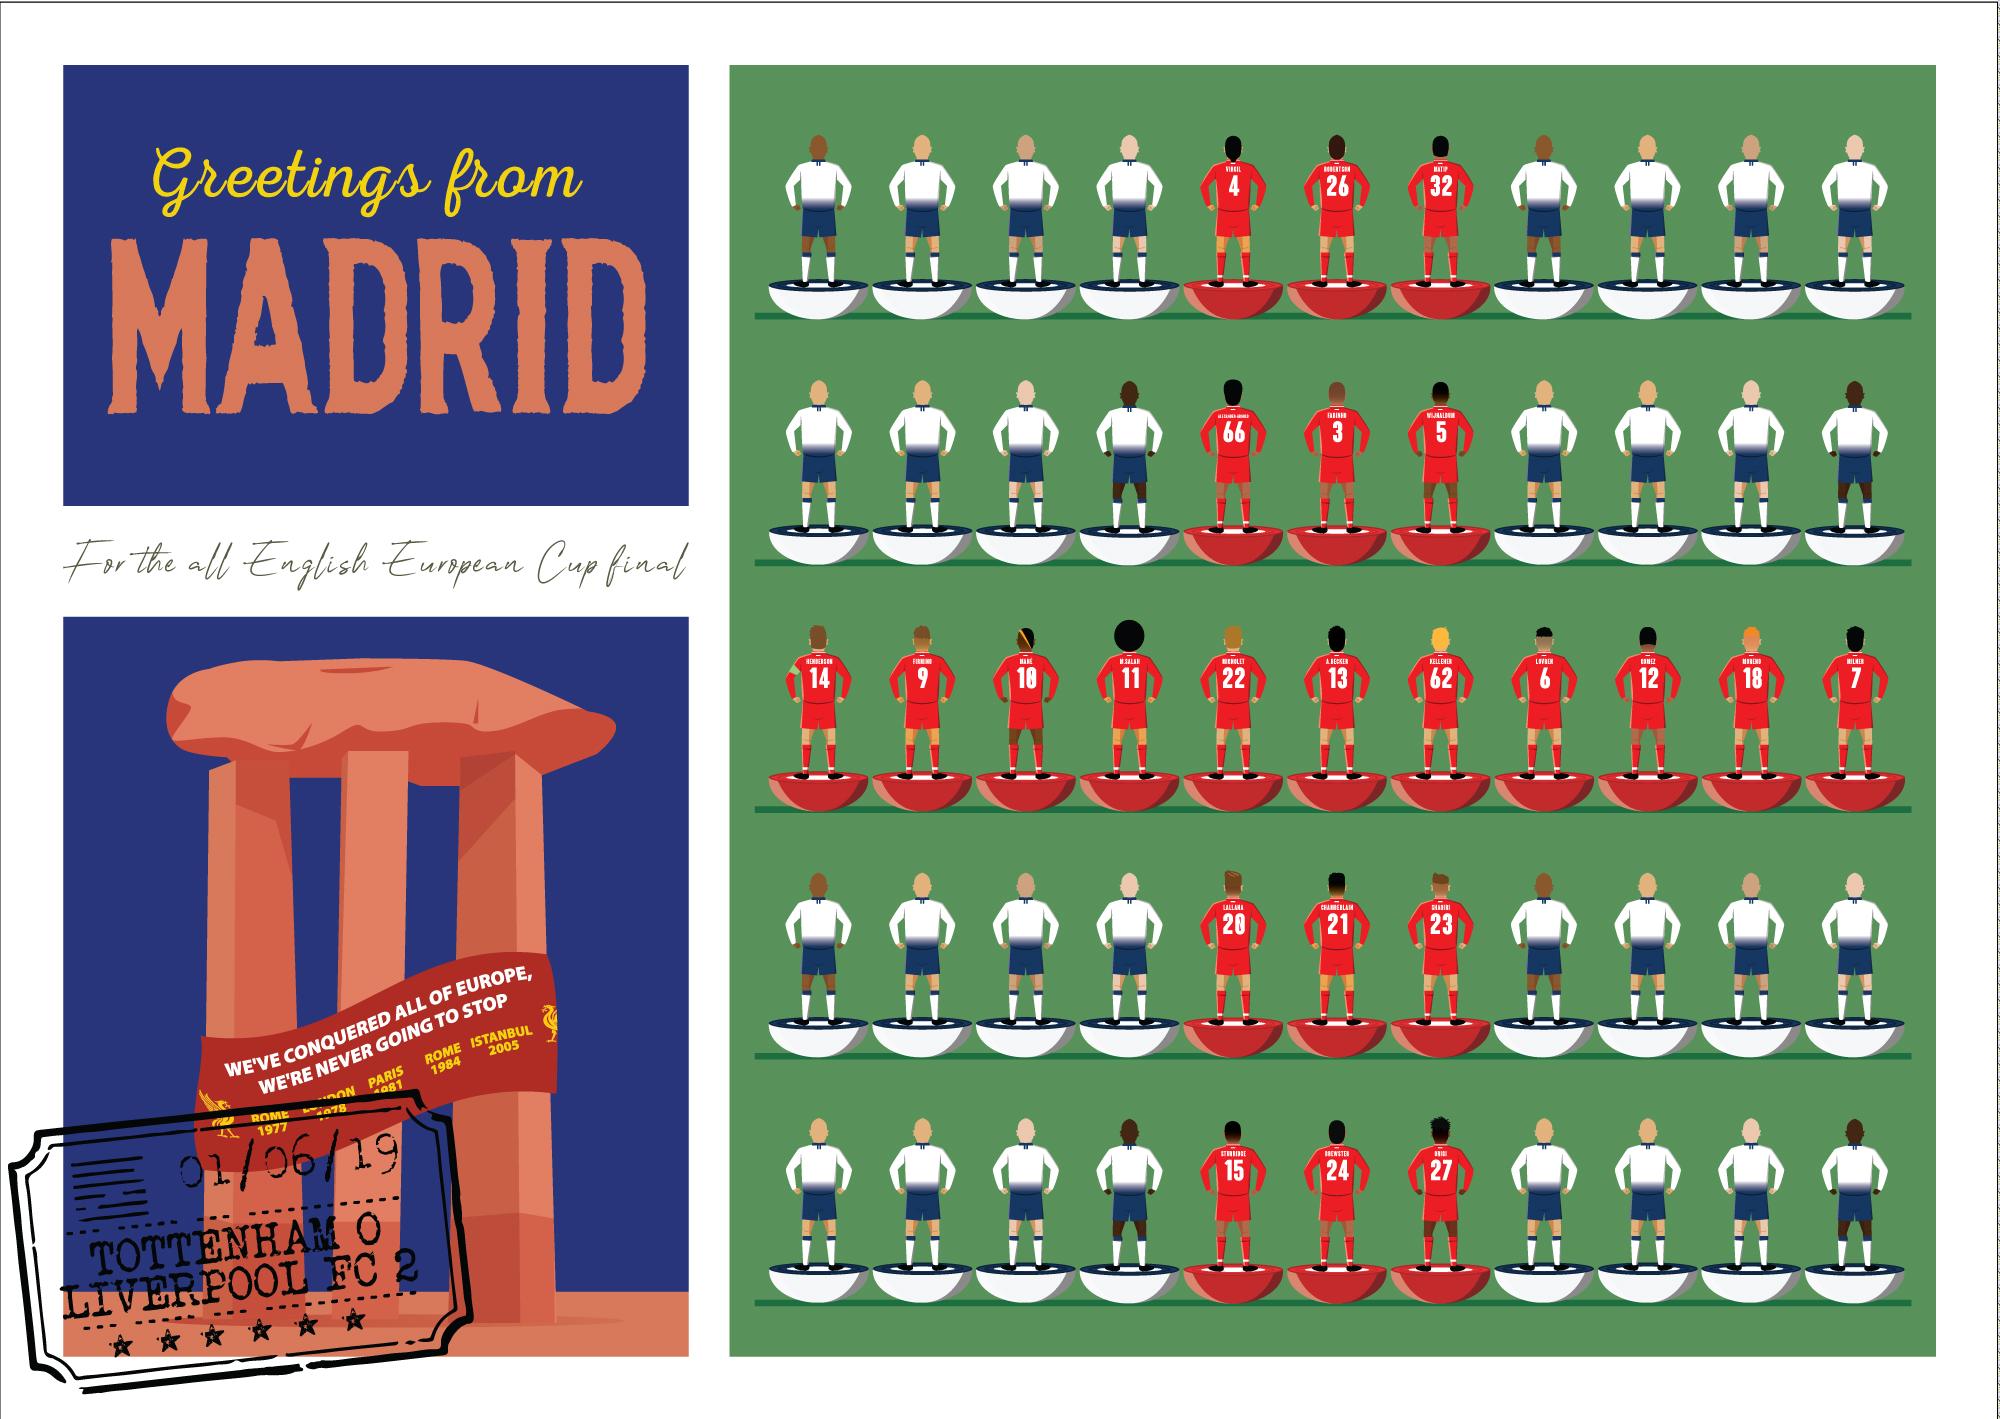 13.-MADRID-FINAL_v_Spurs.jpg